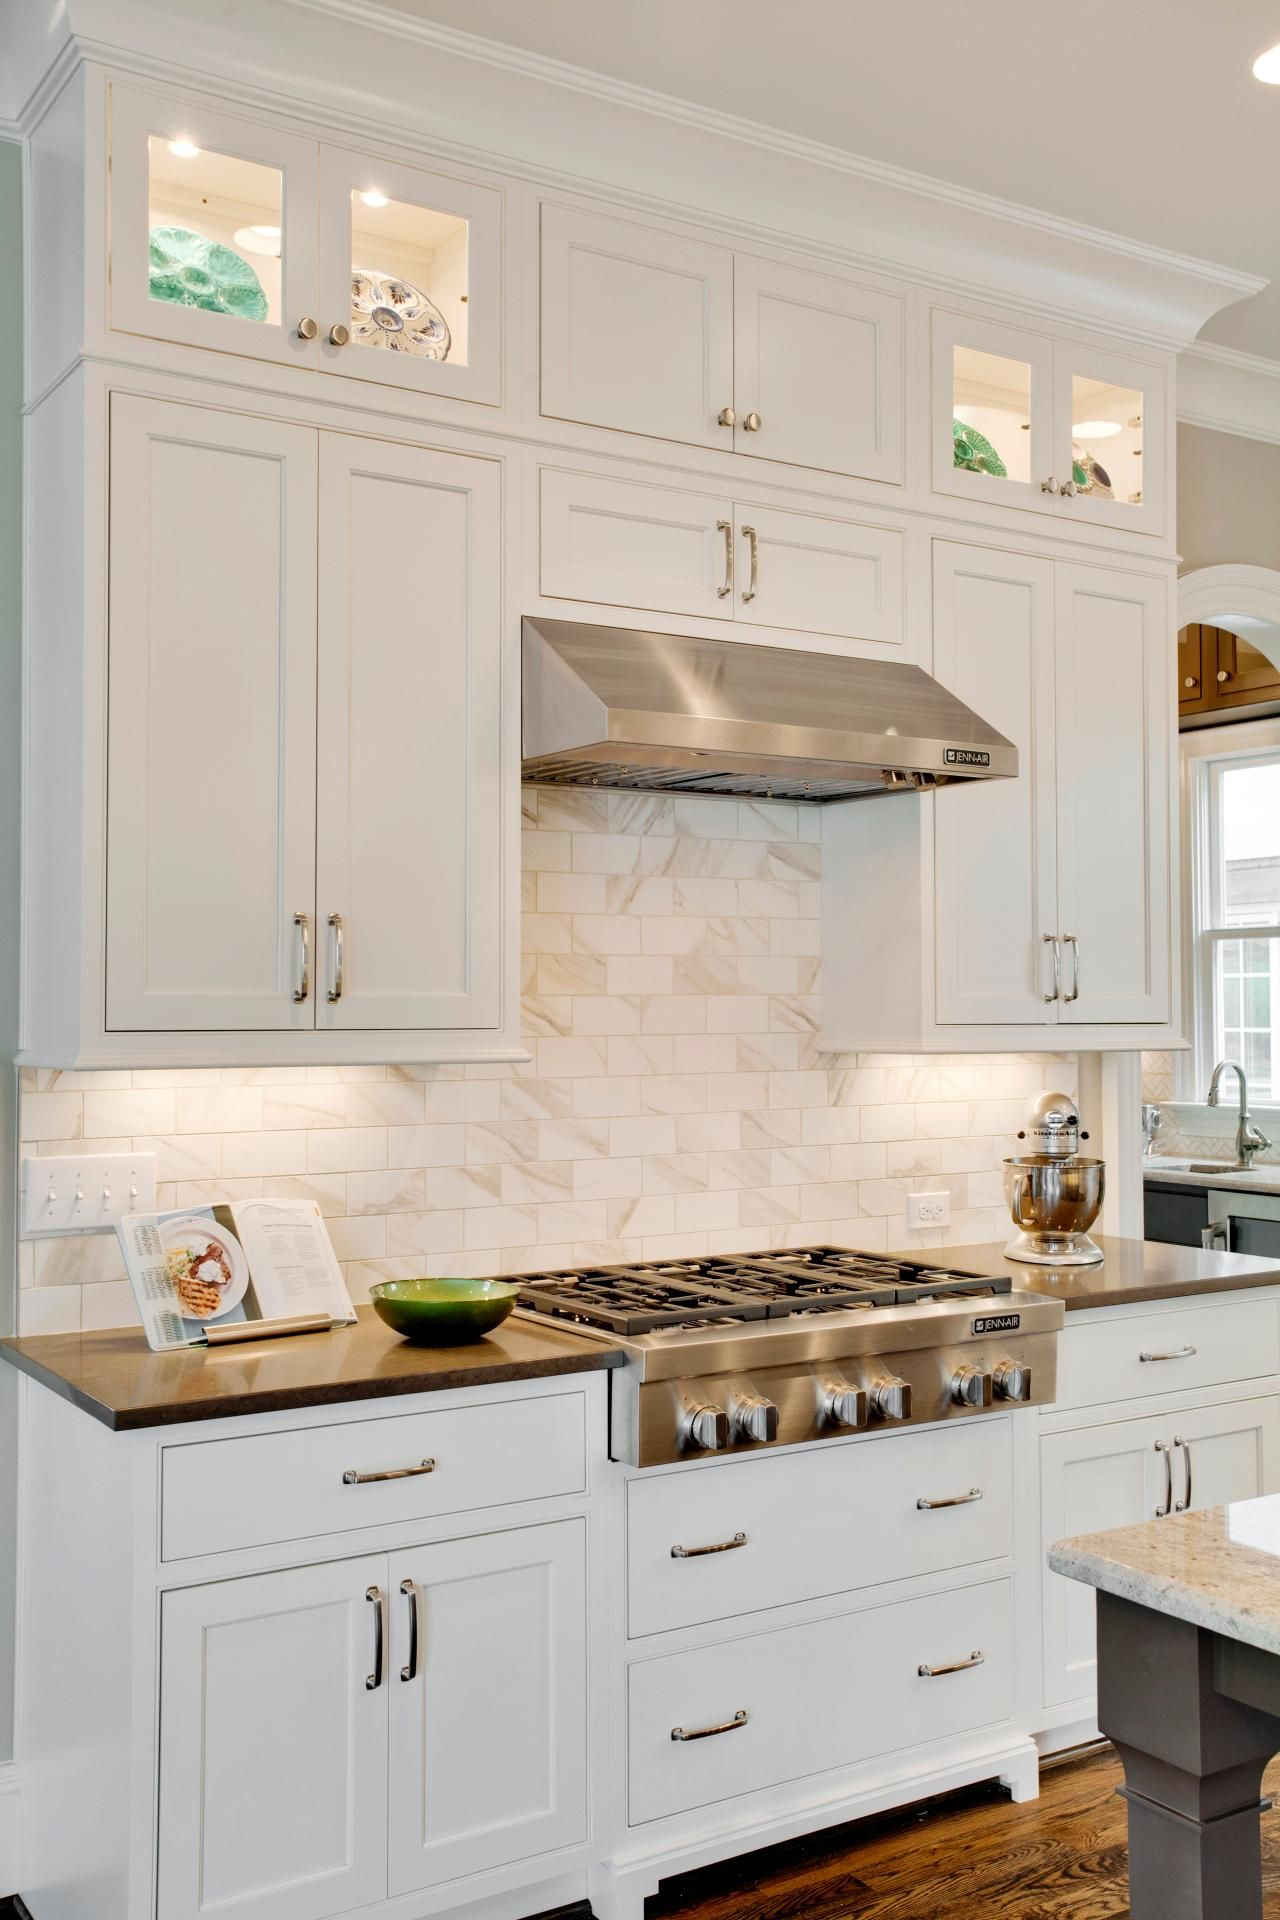 White Shaker Cabinets Pair With Marble Kitchen Backsplash | HGTV